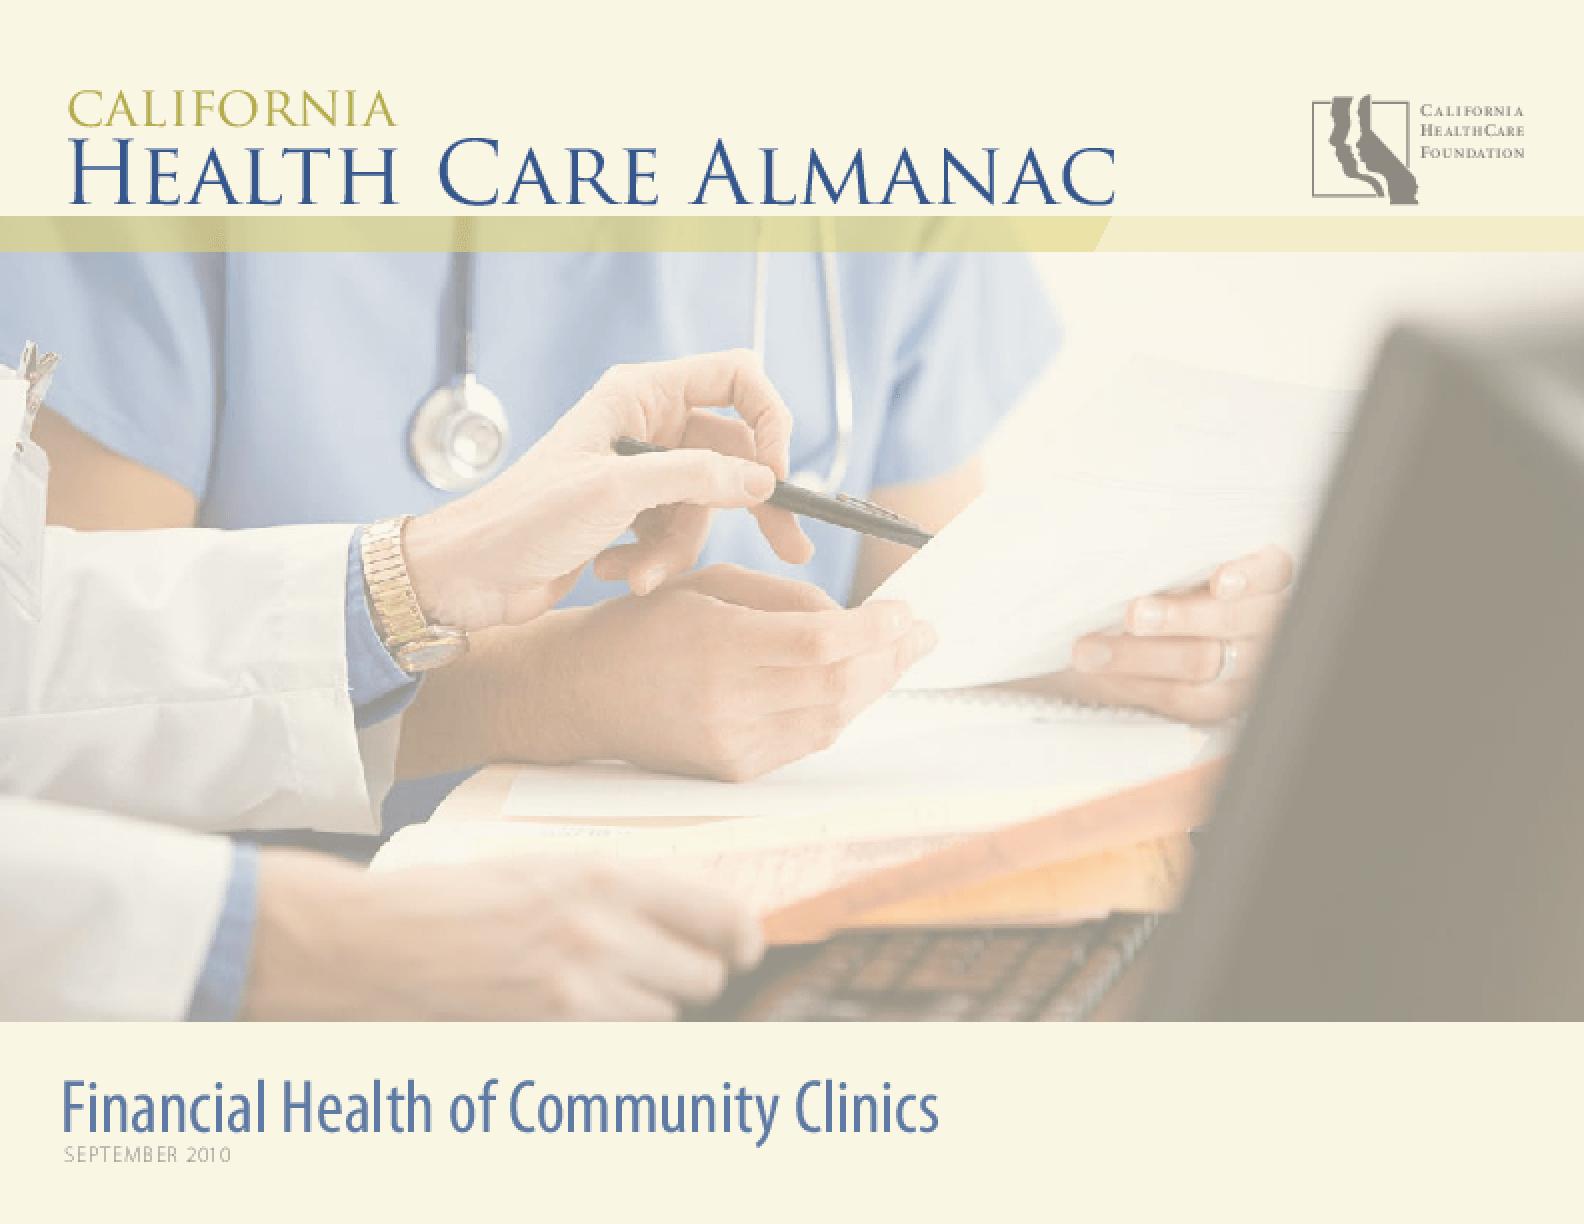 Financial Health of Community Clinics 2010